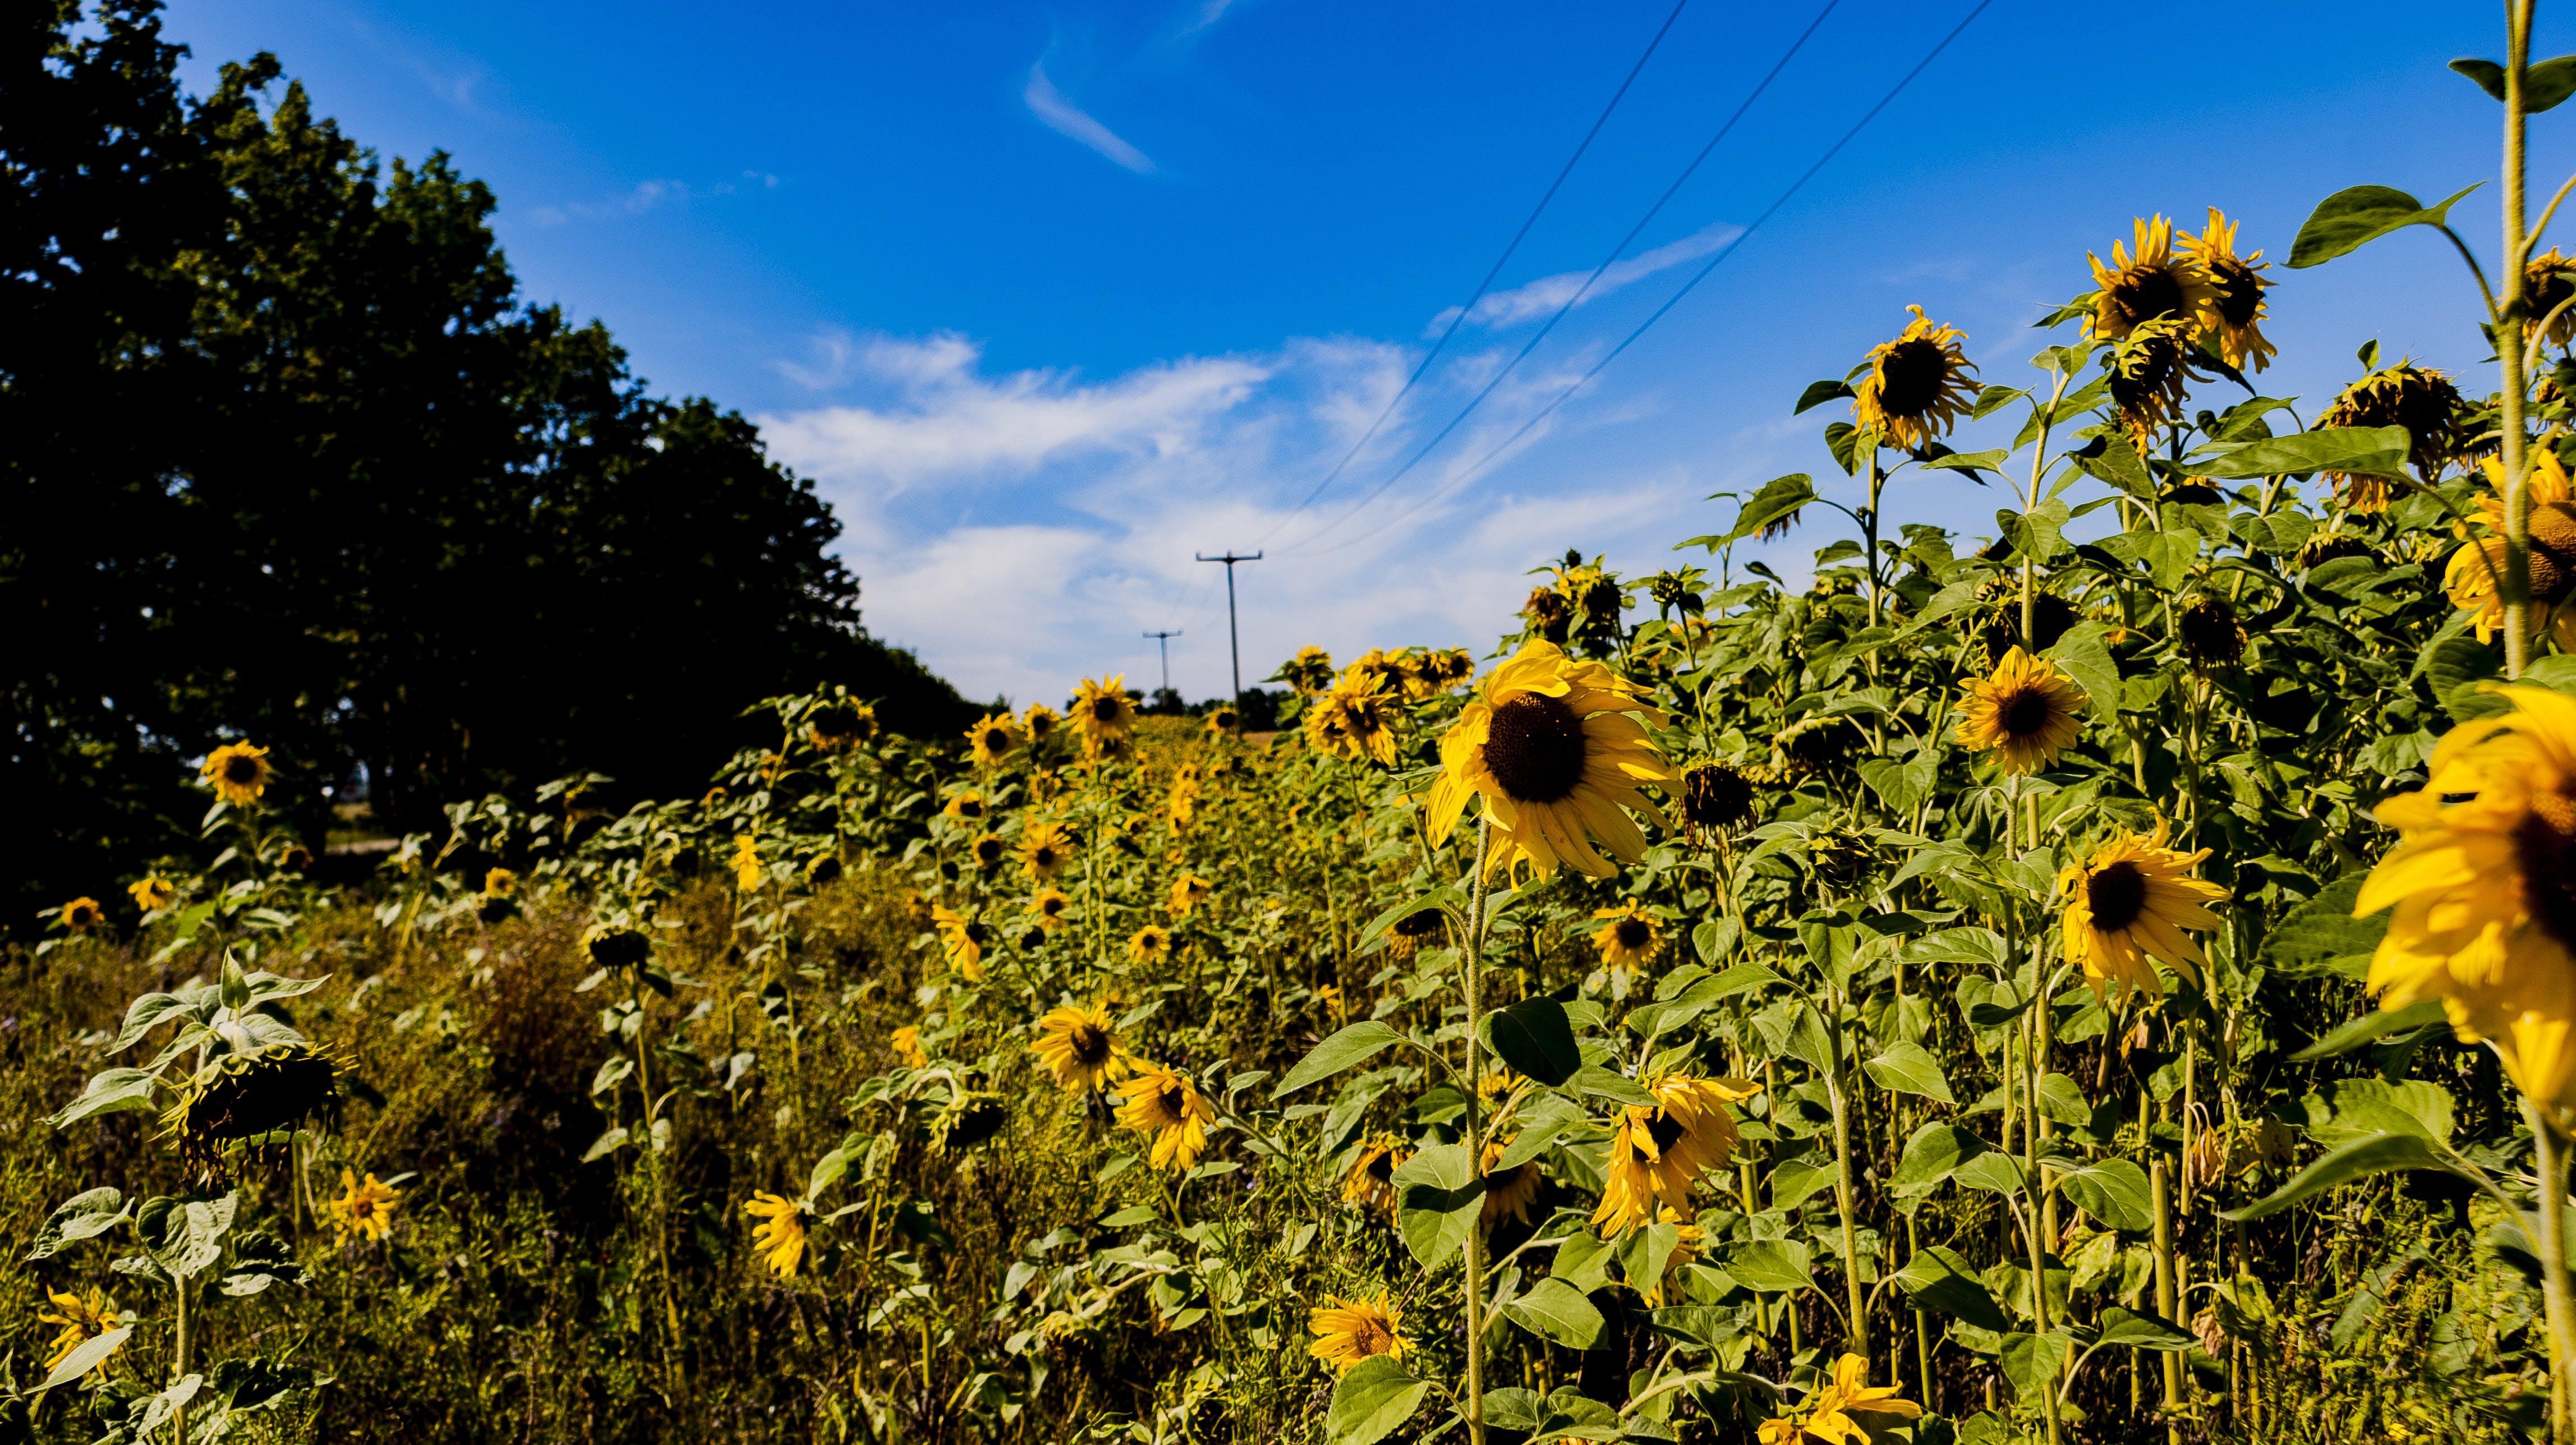 Free stock photo of landscape, sunflowers